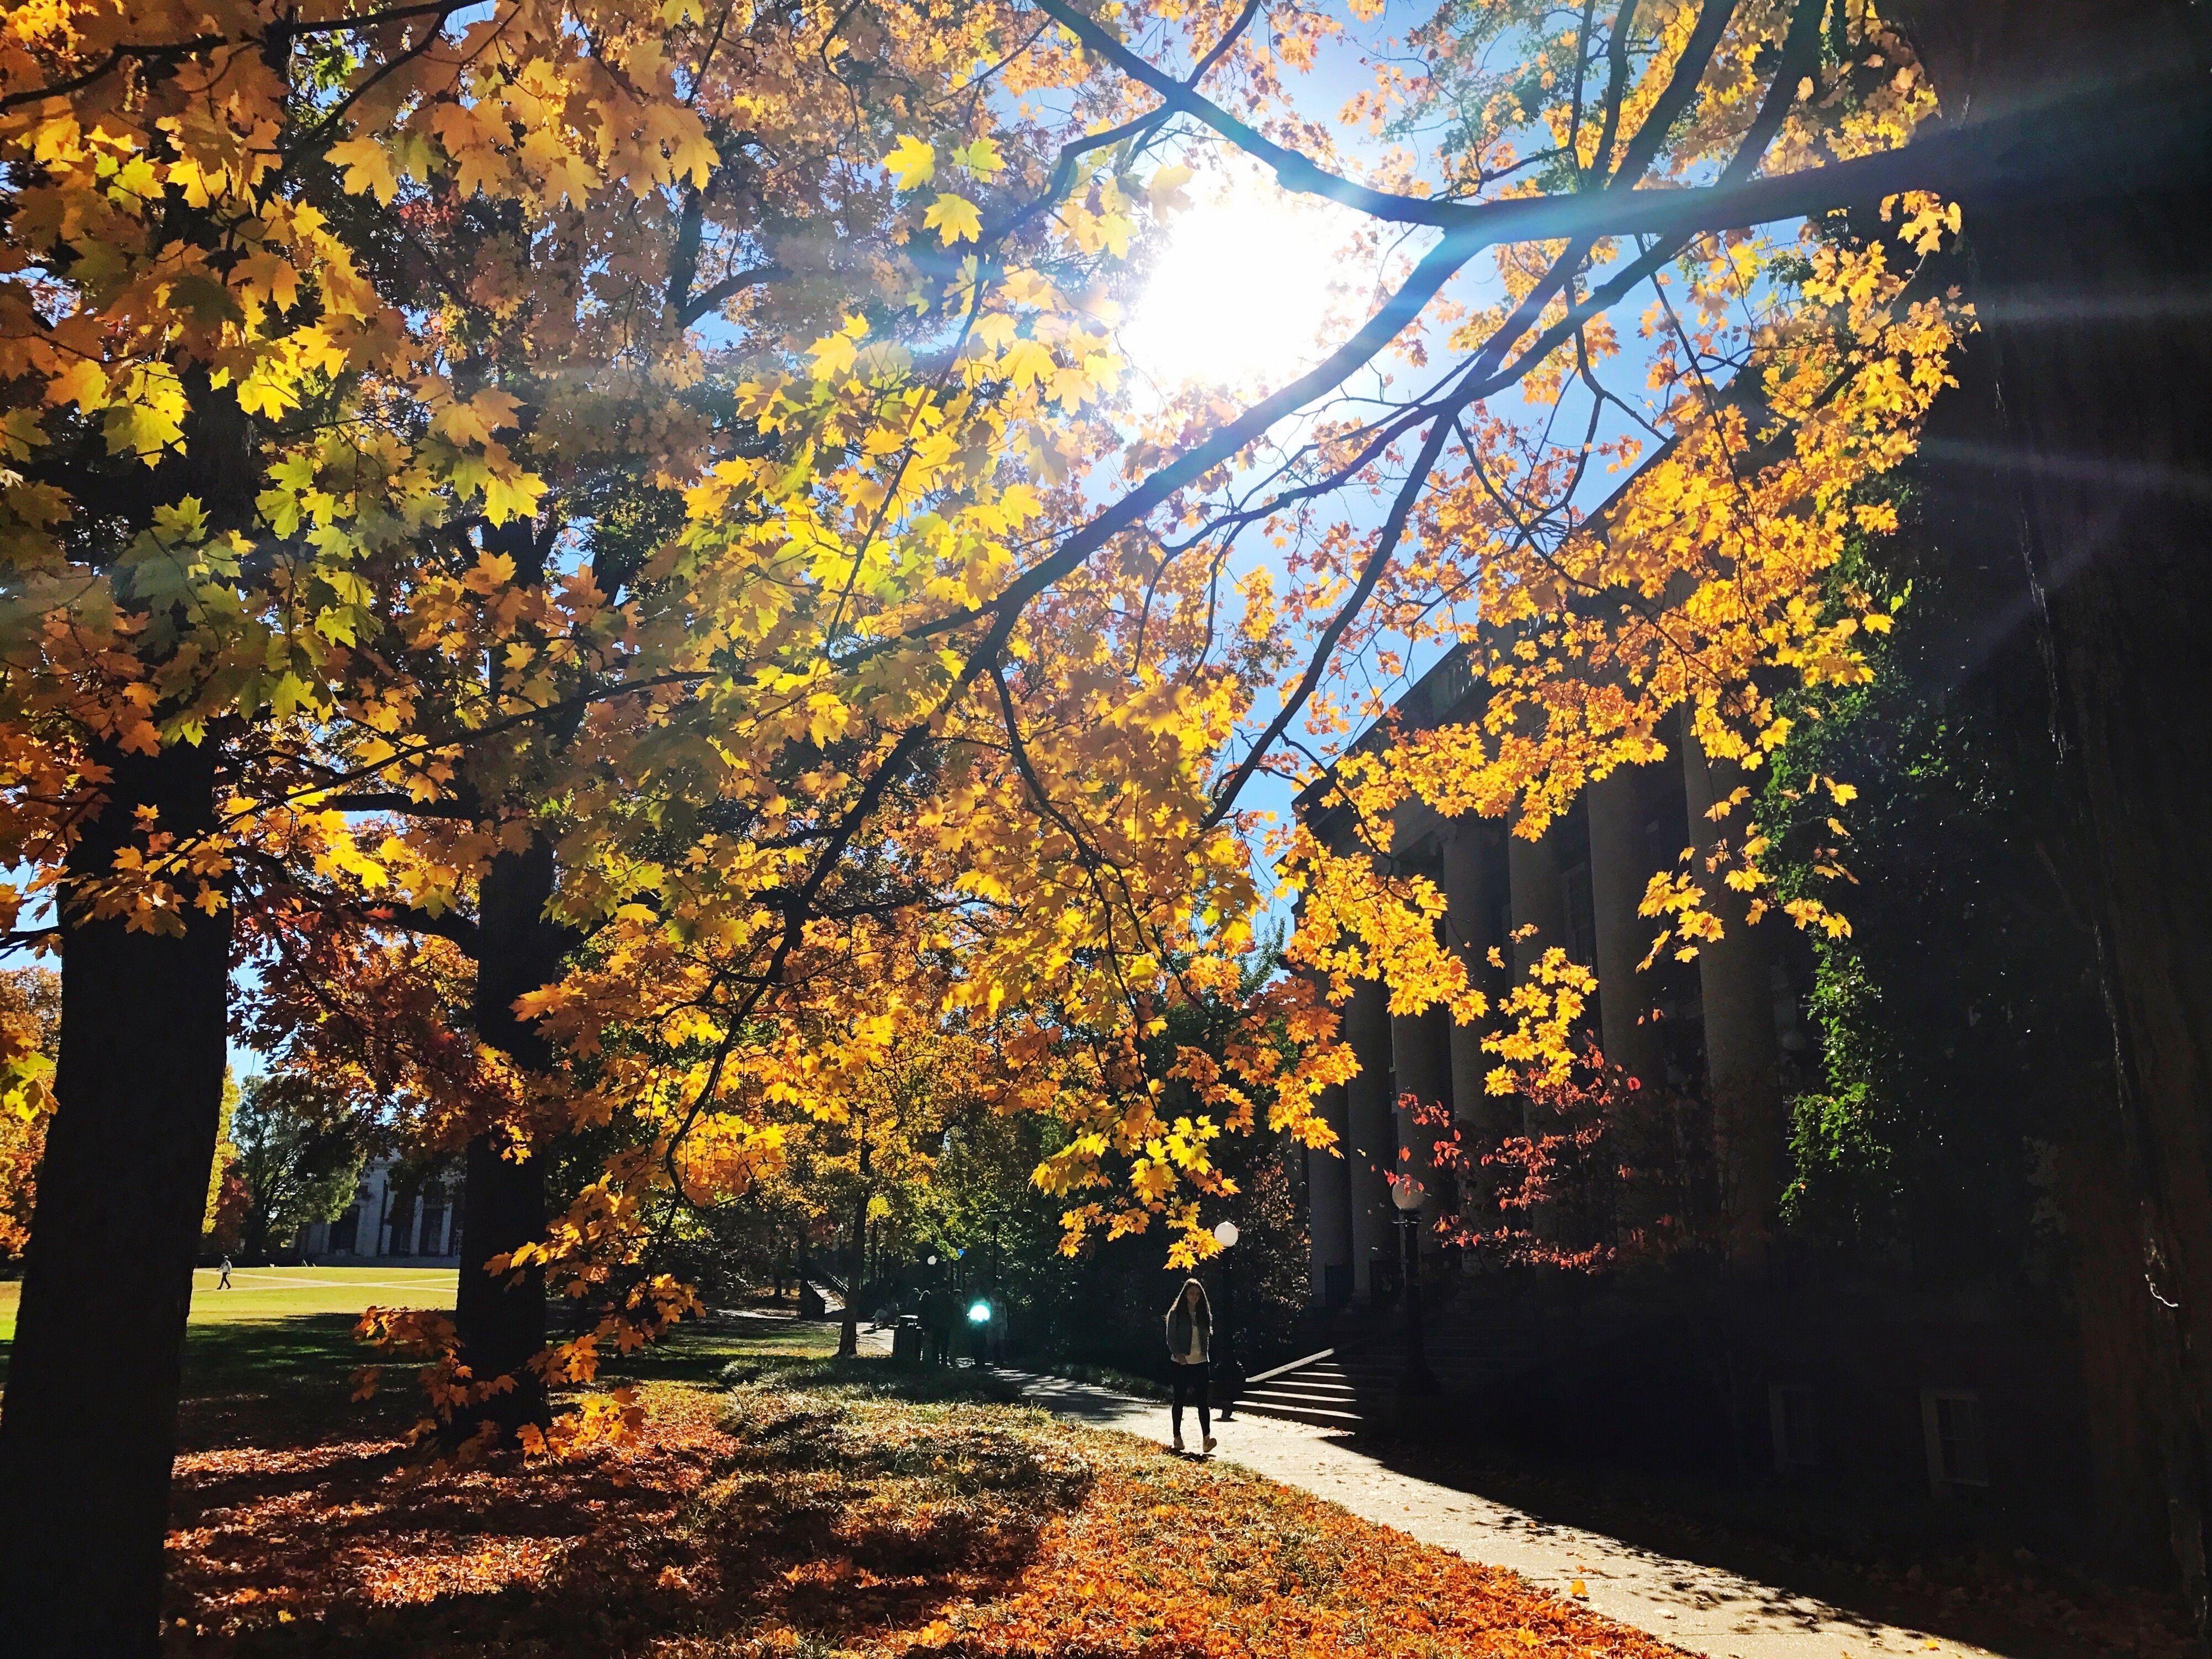 Yellow Flowers On Tree During Autumn in Nashville